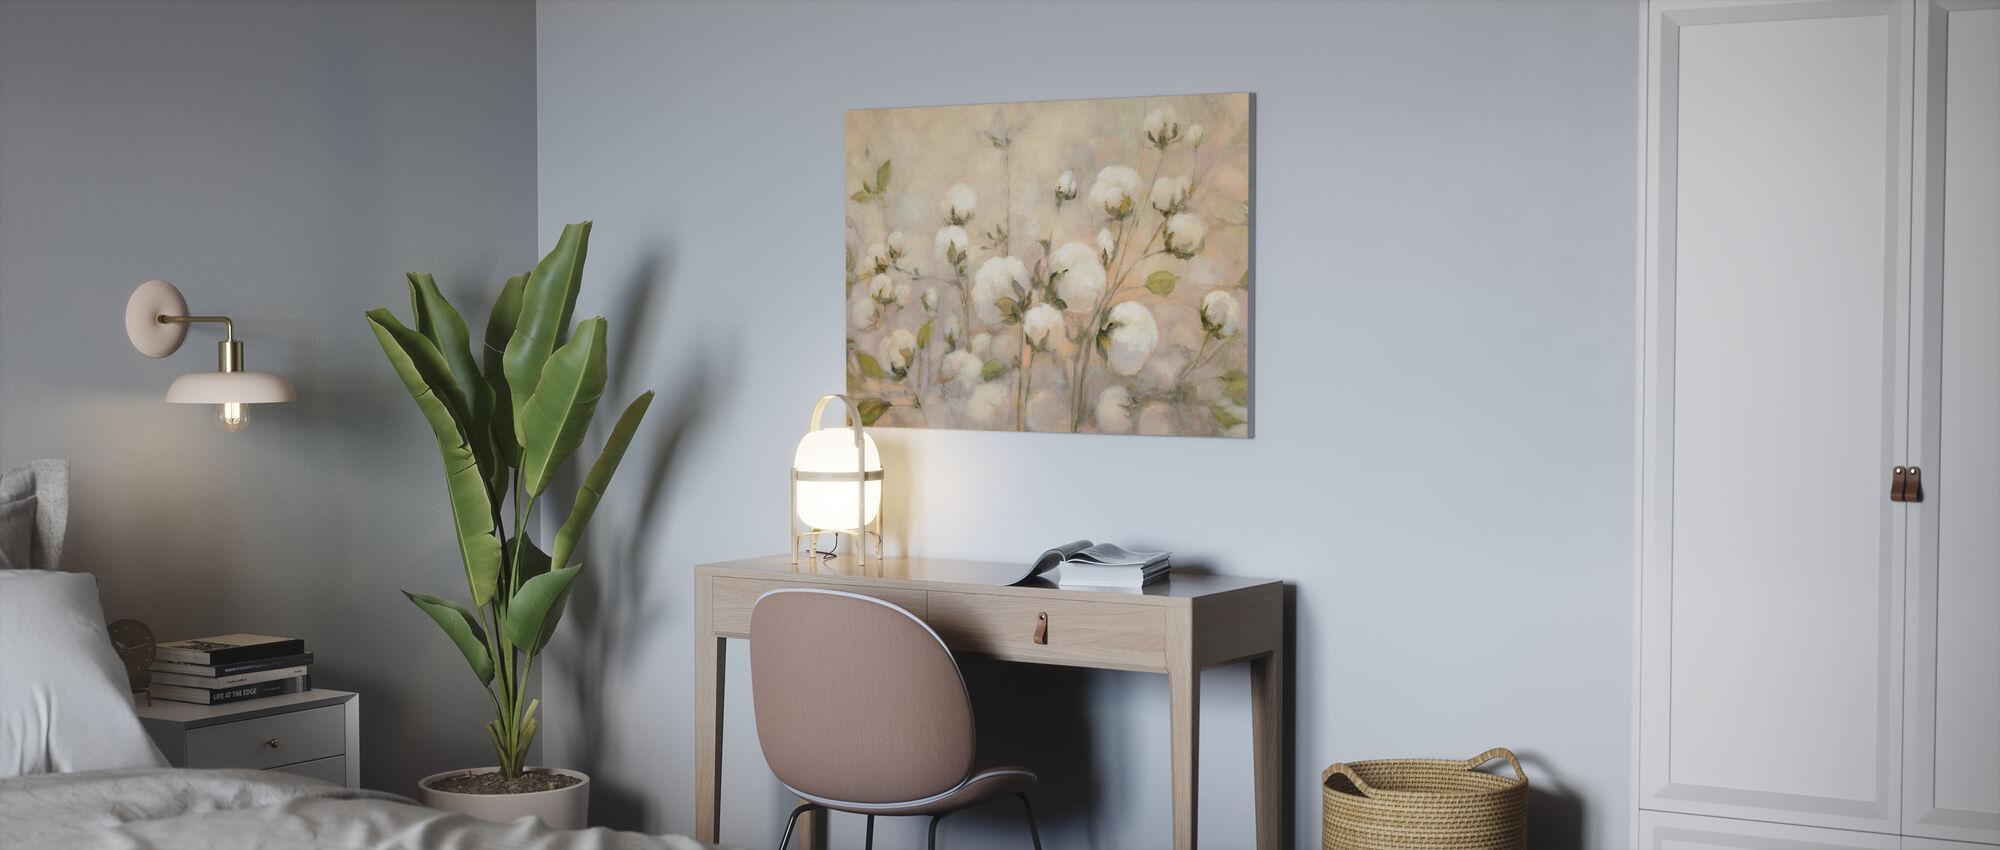 Cotton Field - Canvas print - Office